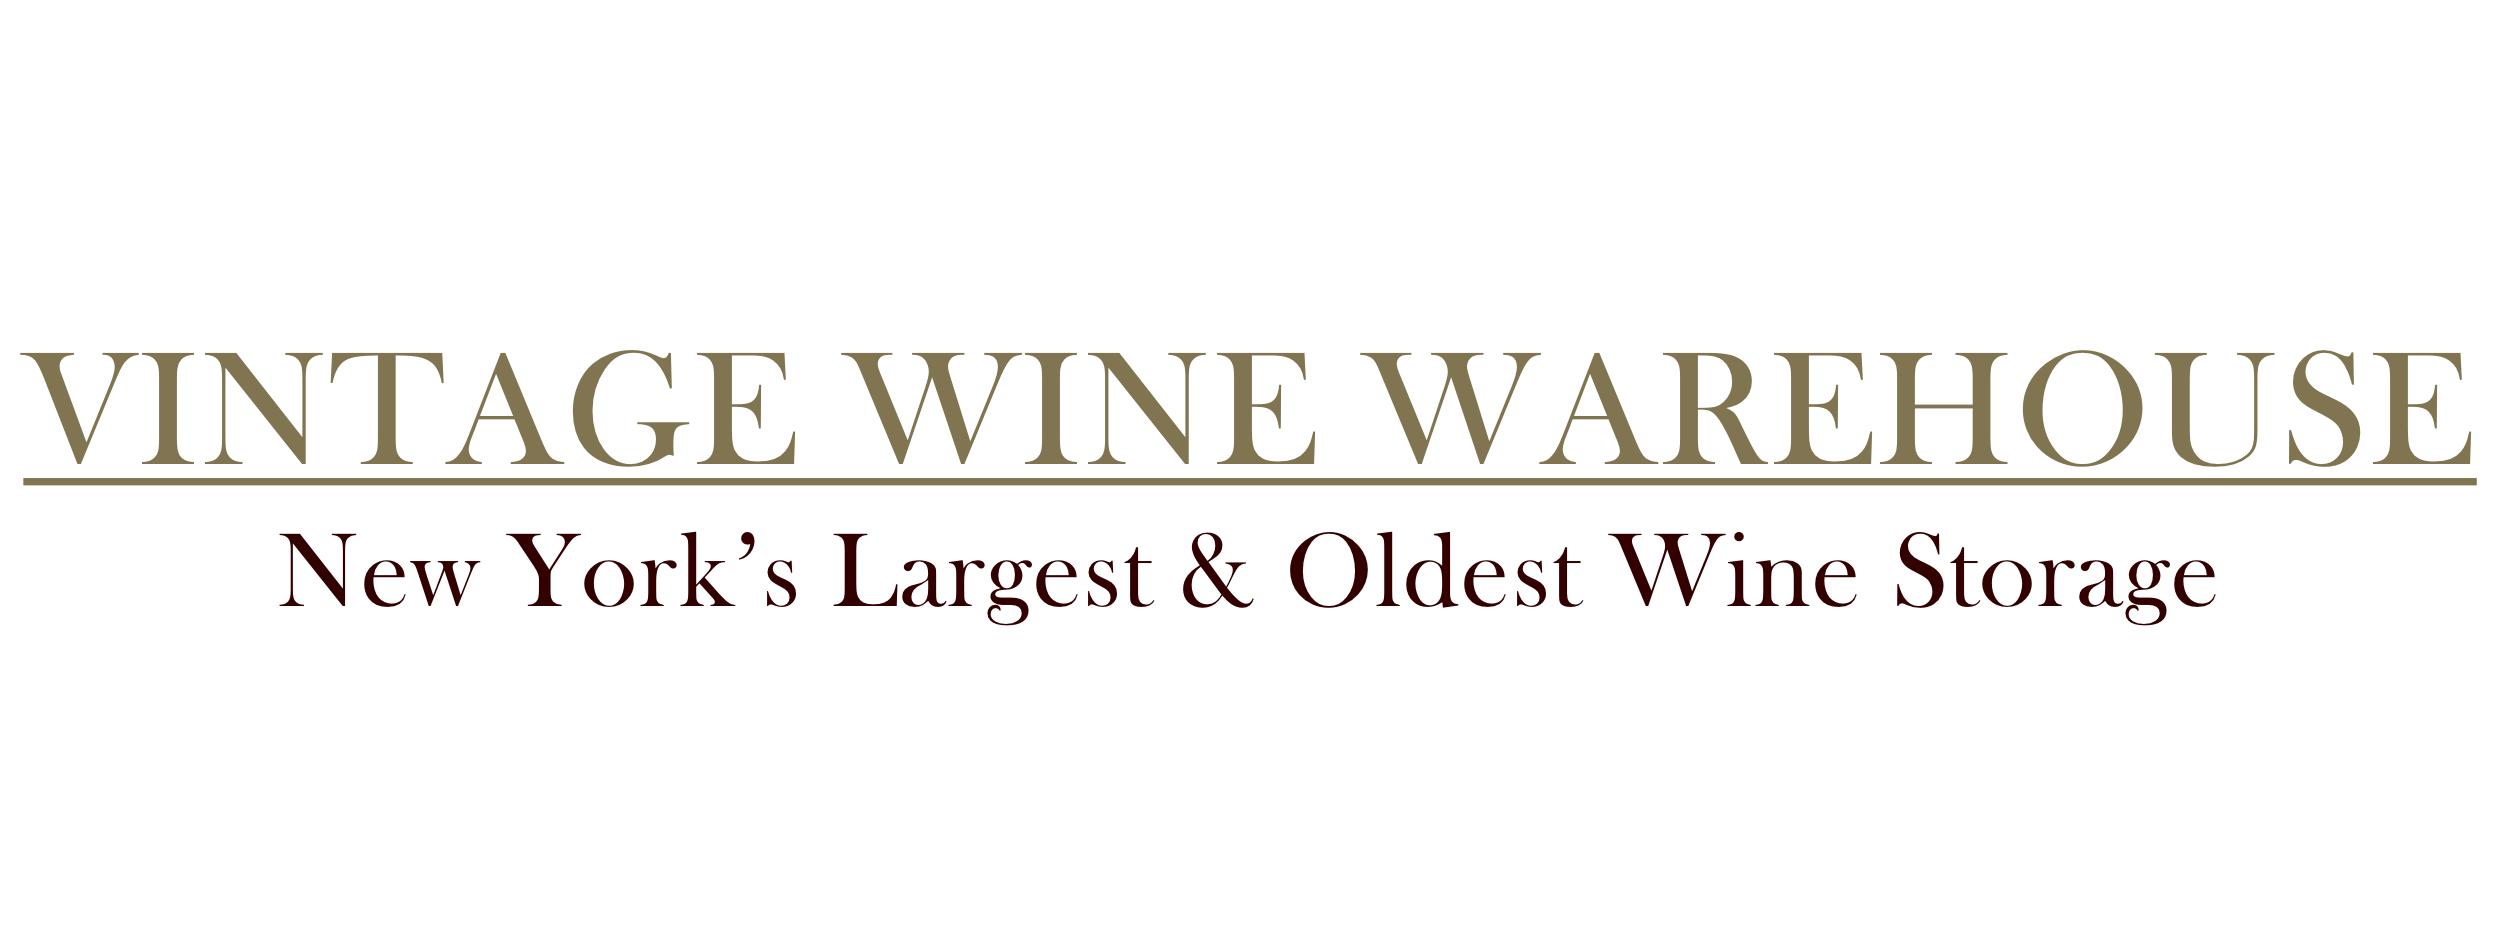 Vintage Wine Warehouse Test (6).png